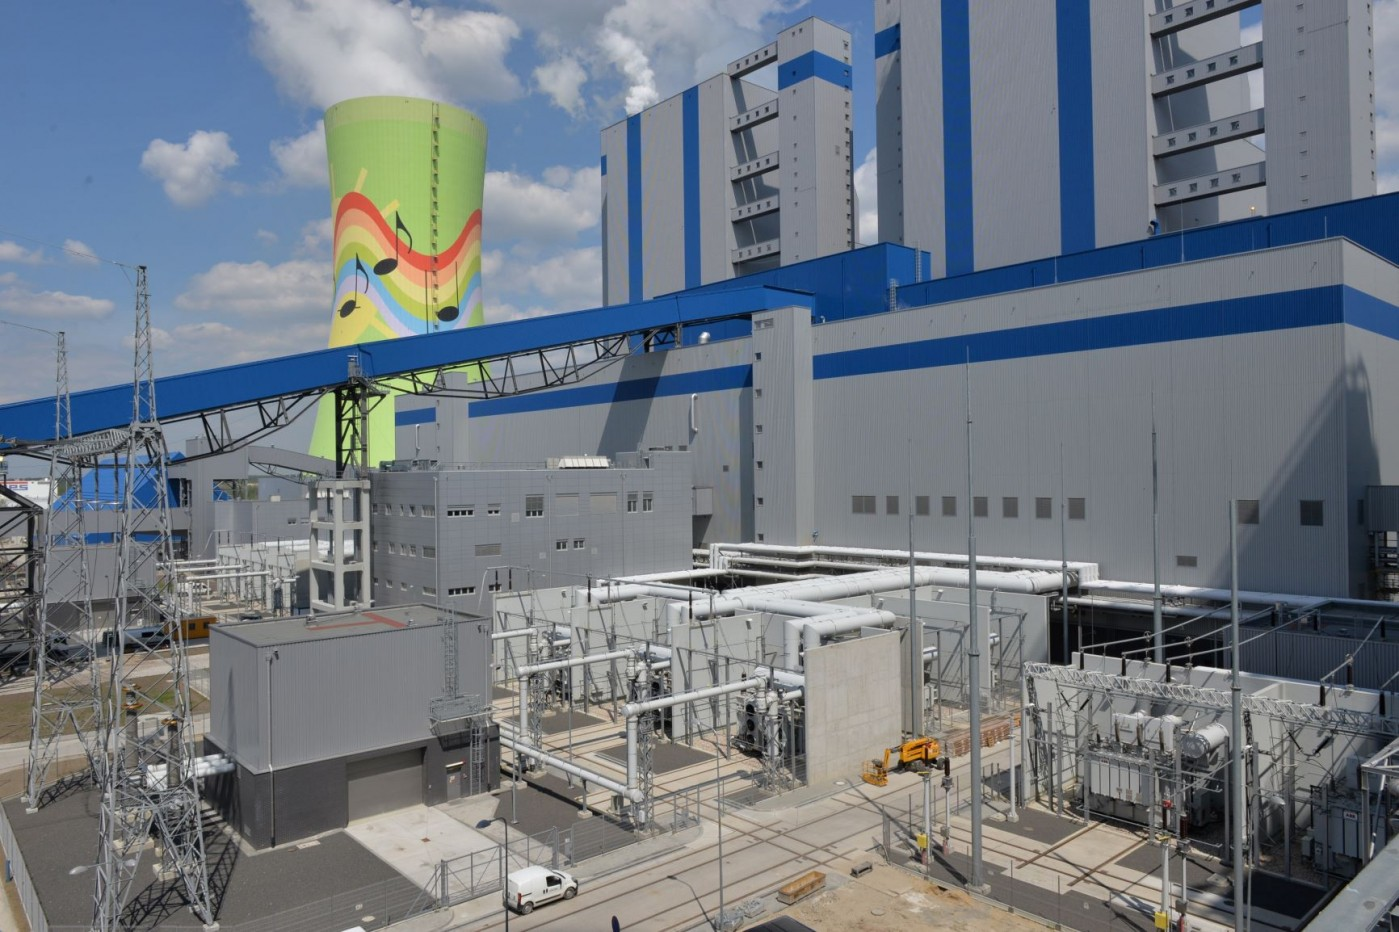 pge_elektrownia-opole_maj-2019-r-jpg